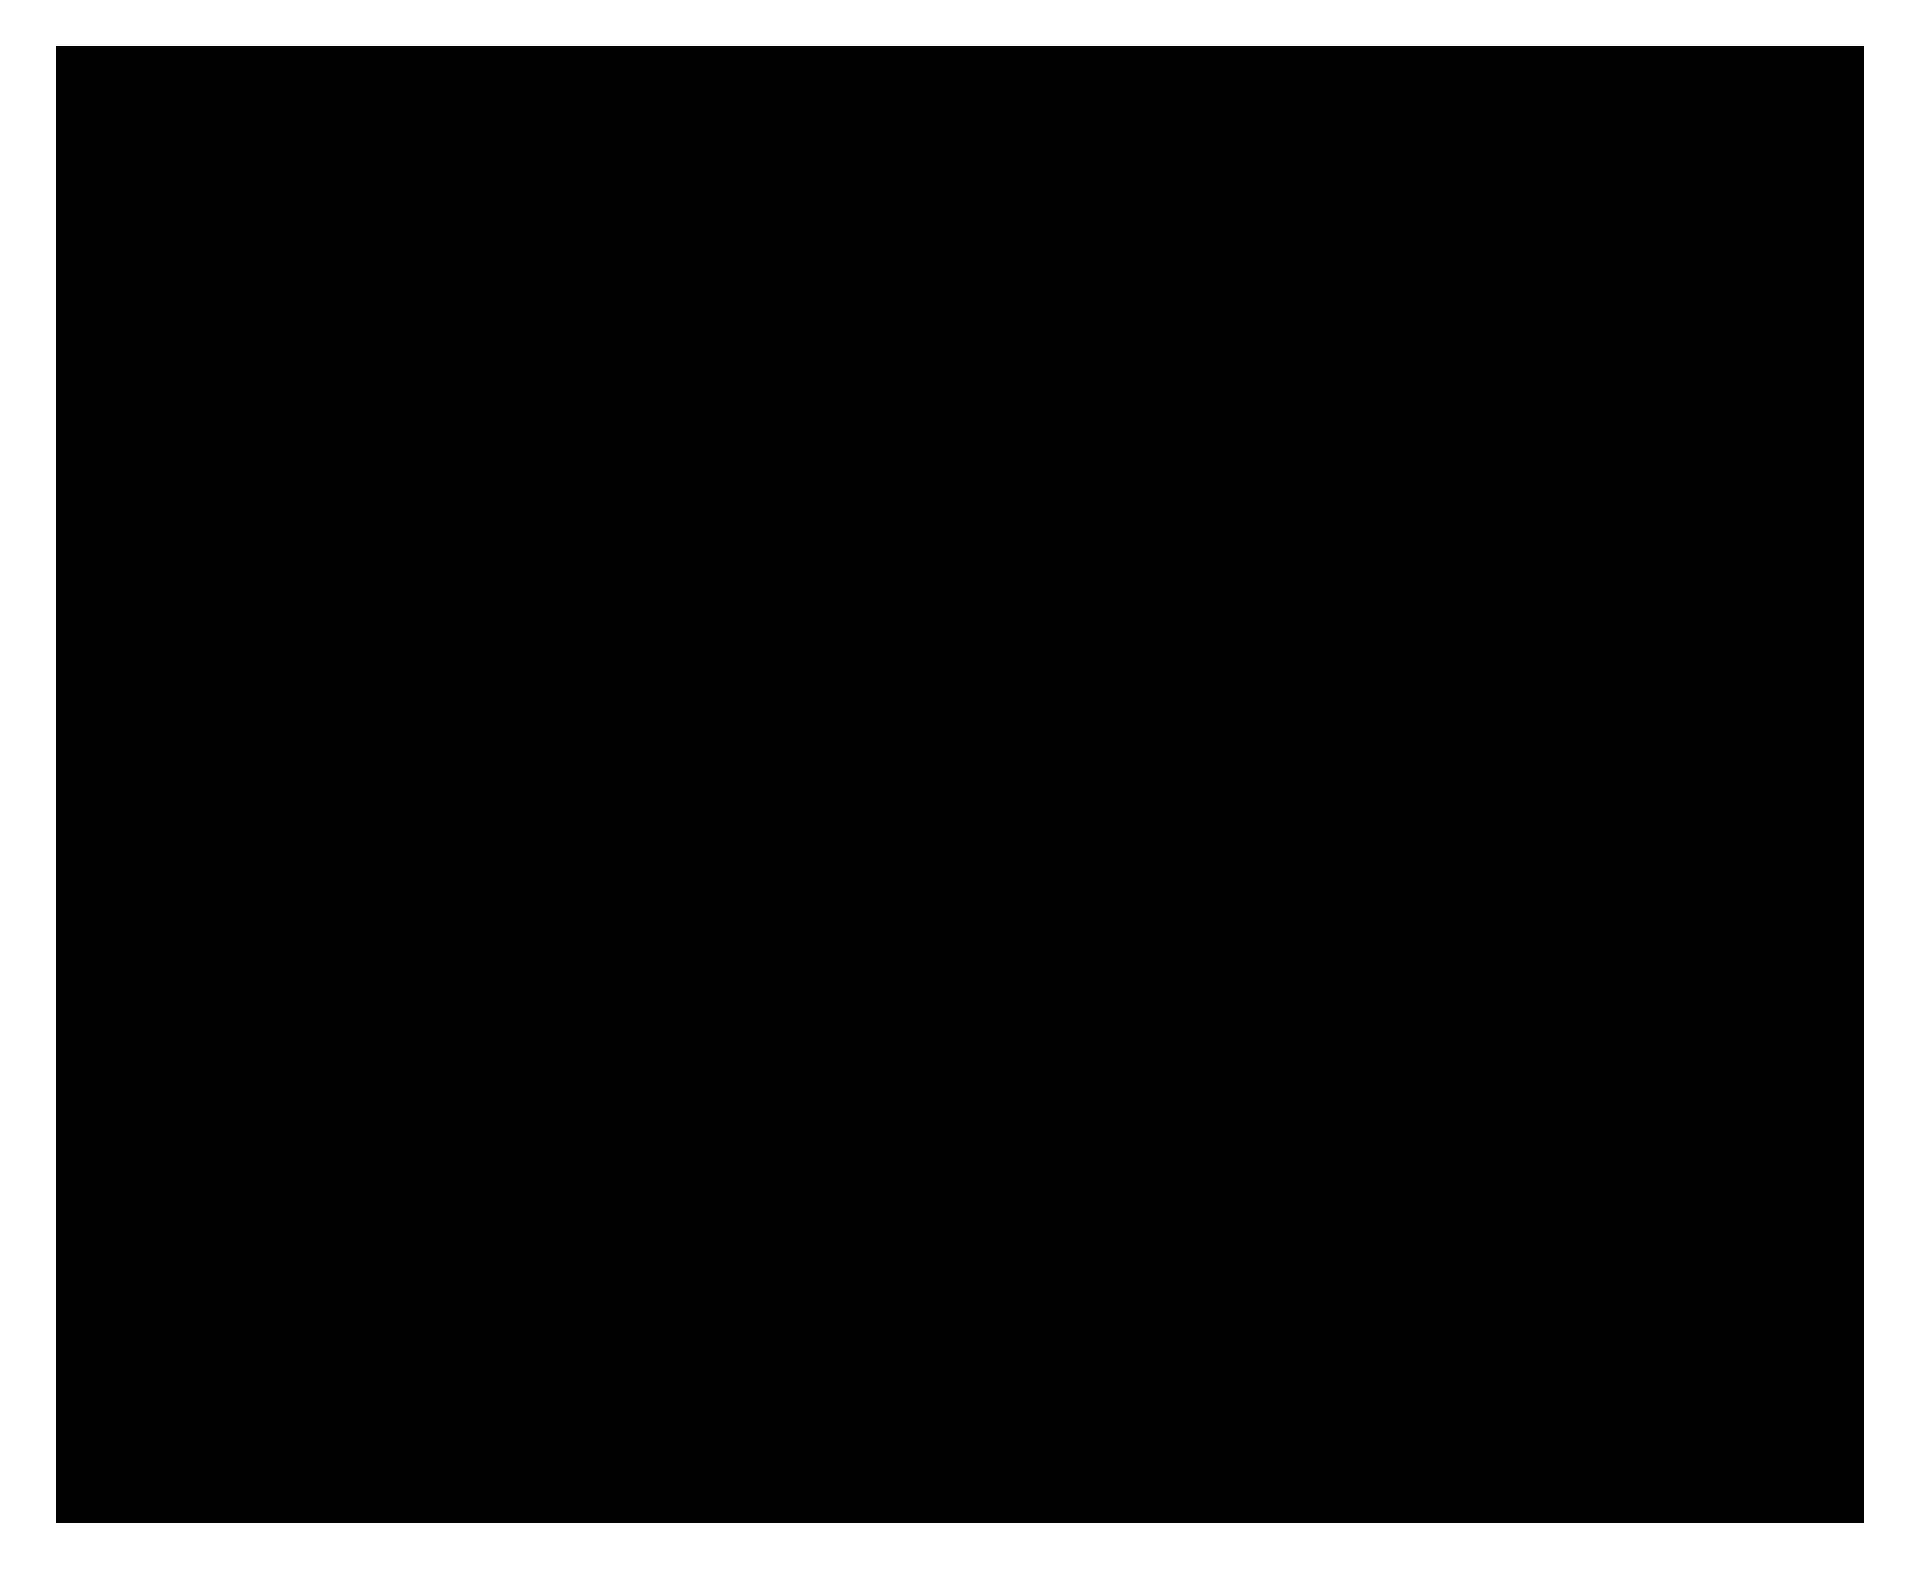 Steadfast Concrete - Logo - Black